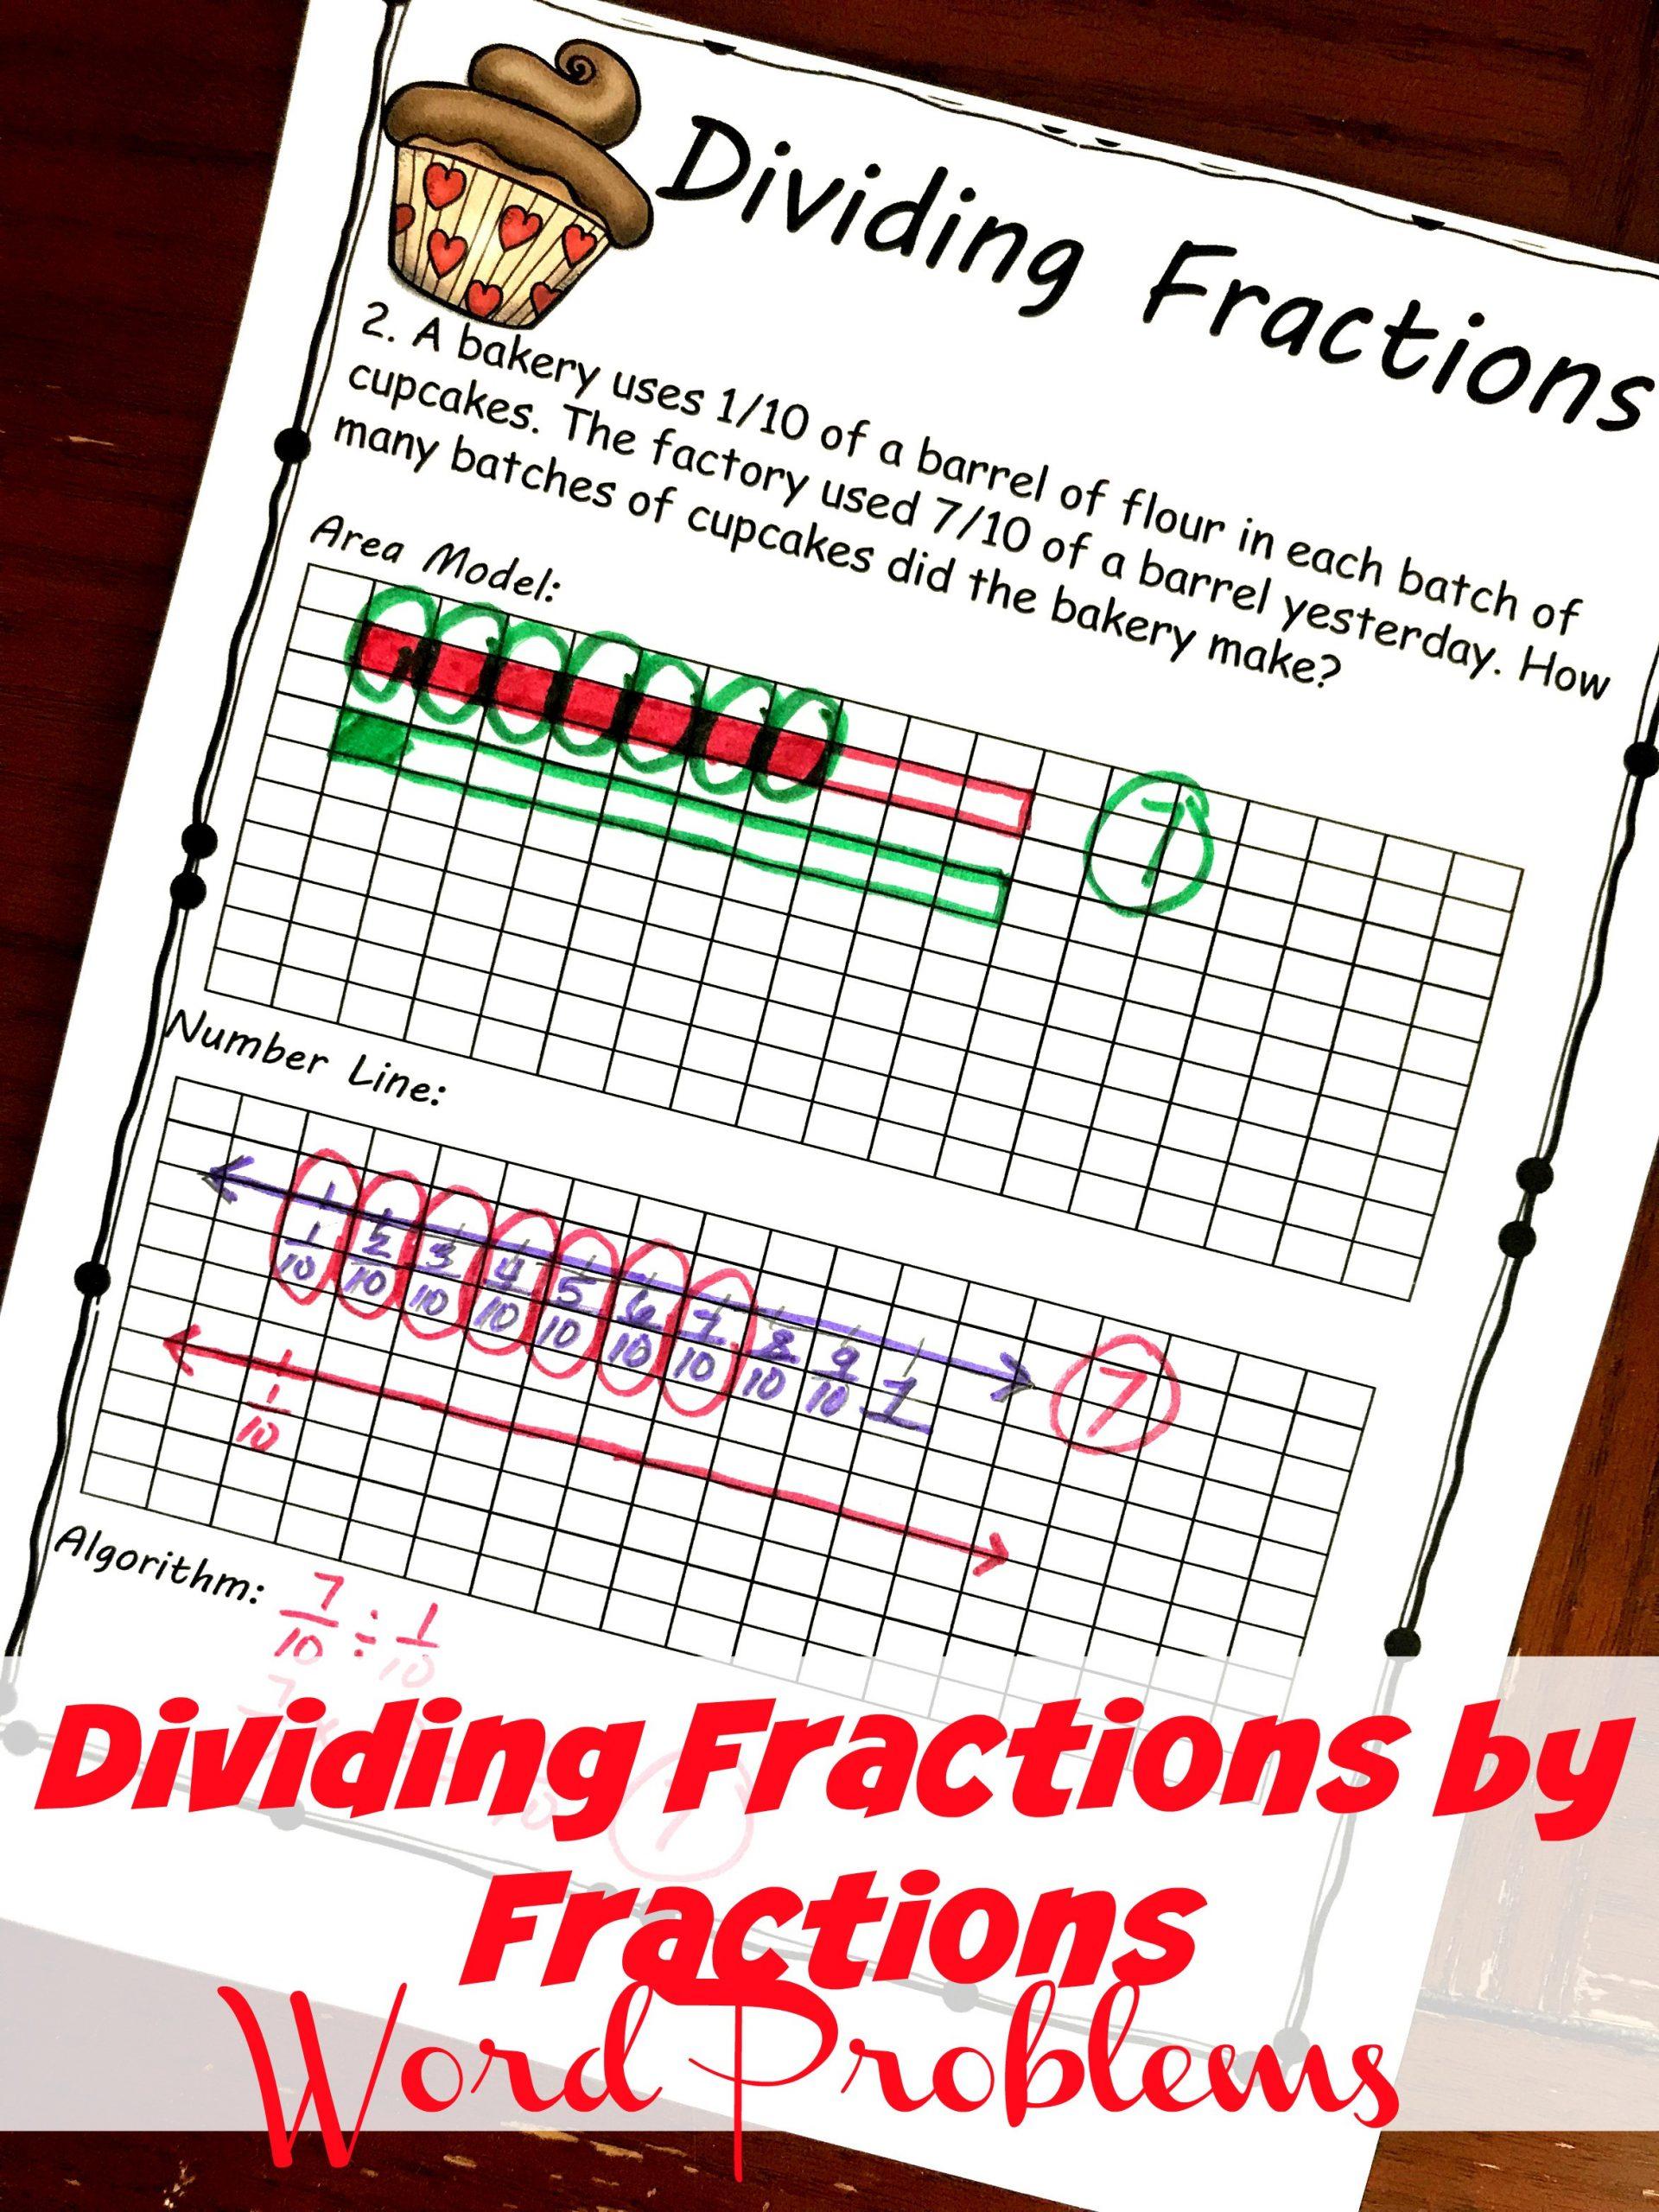 Dividing Fractions Word Problems Worksheet Free Yummy Word Problems for Dividing Fractions by Fractions